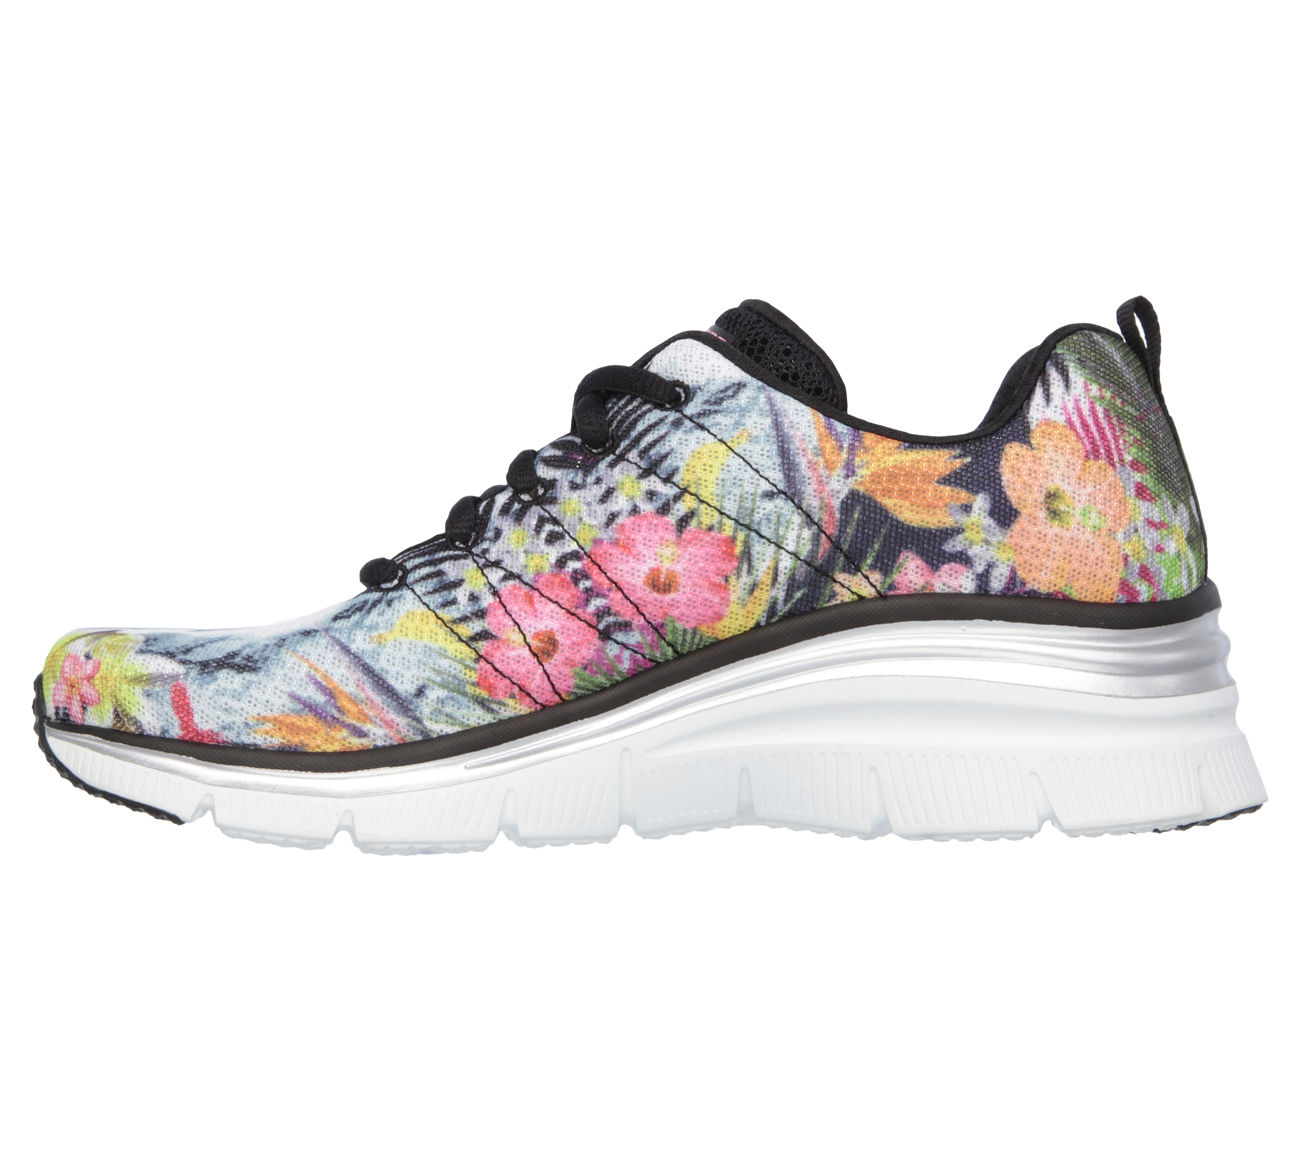 1bacc0851af5 SKECHERS - Skechers 12708 BKMT Women s FASHION FIT-SPRING ESSENTIAL Sneaker  - Walmart.com